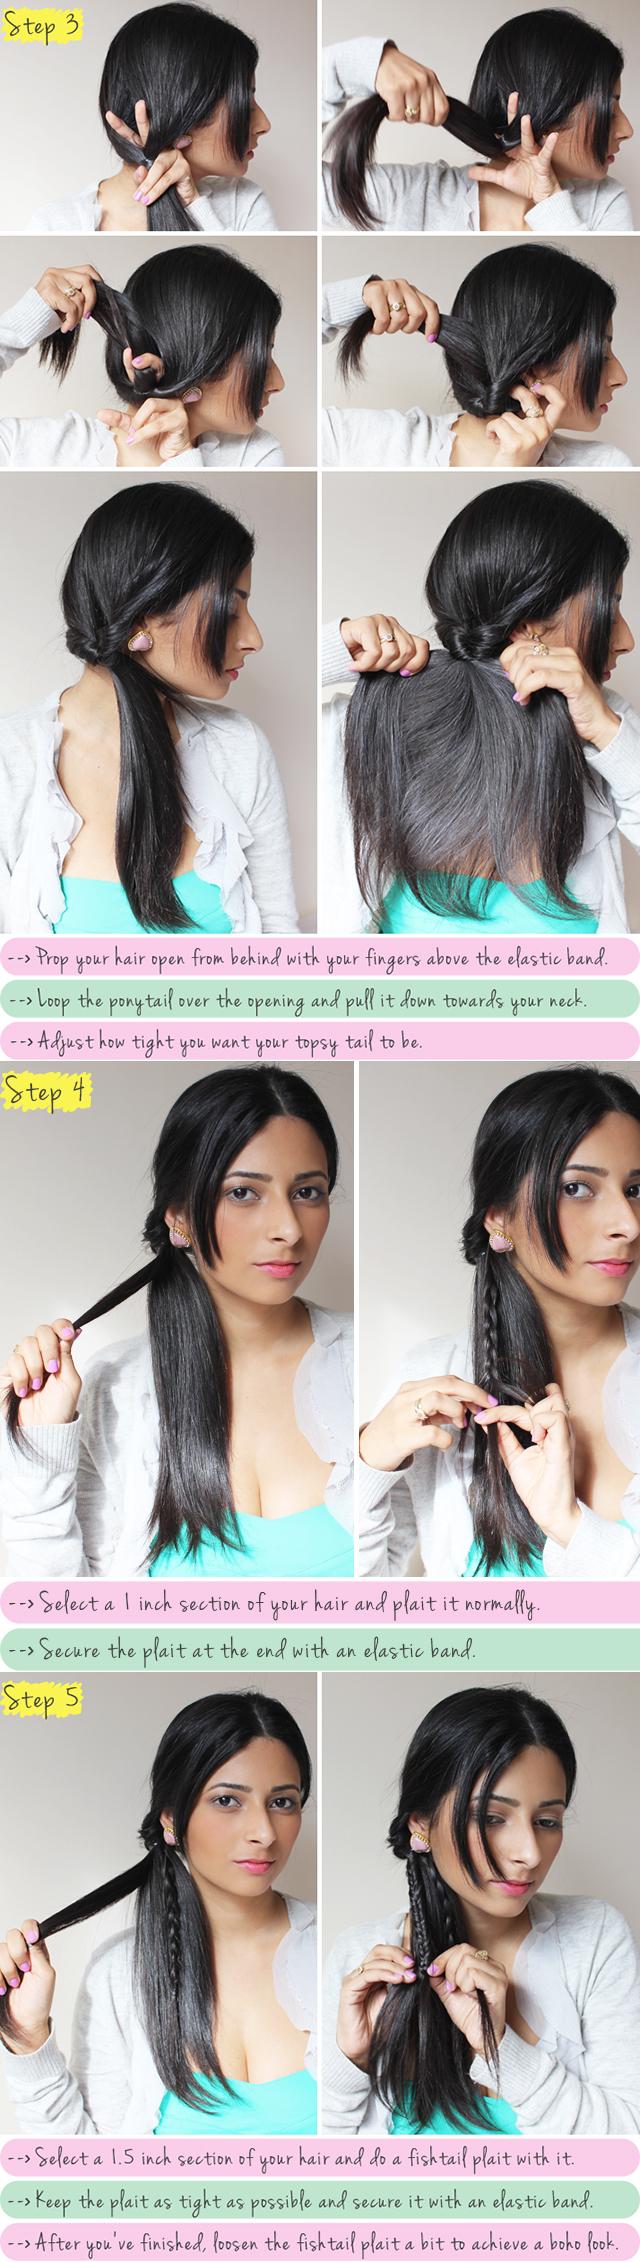 Boho-chic Braided Hairstyle Tutorial